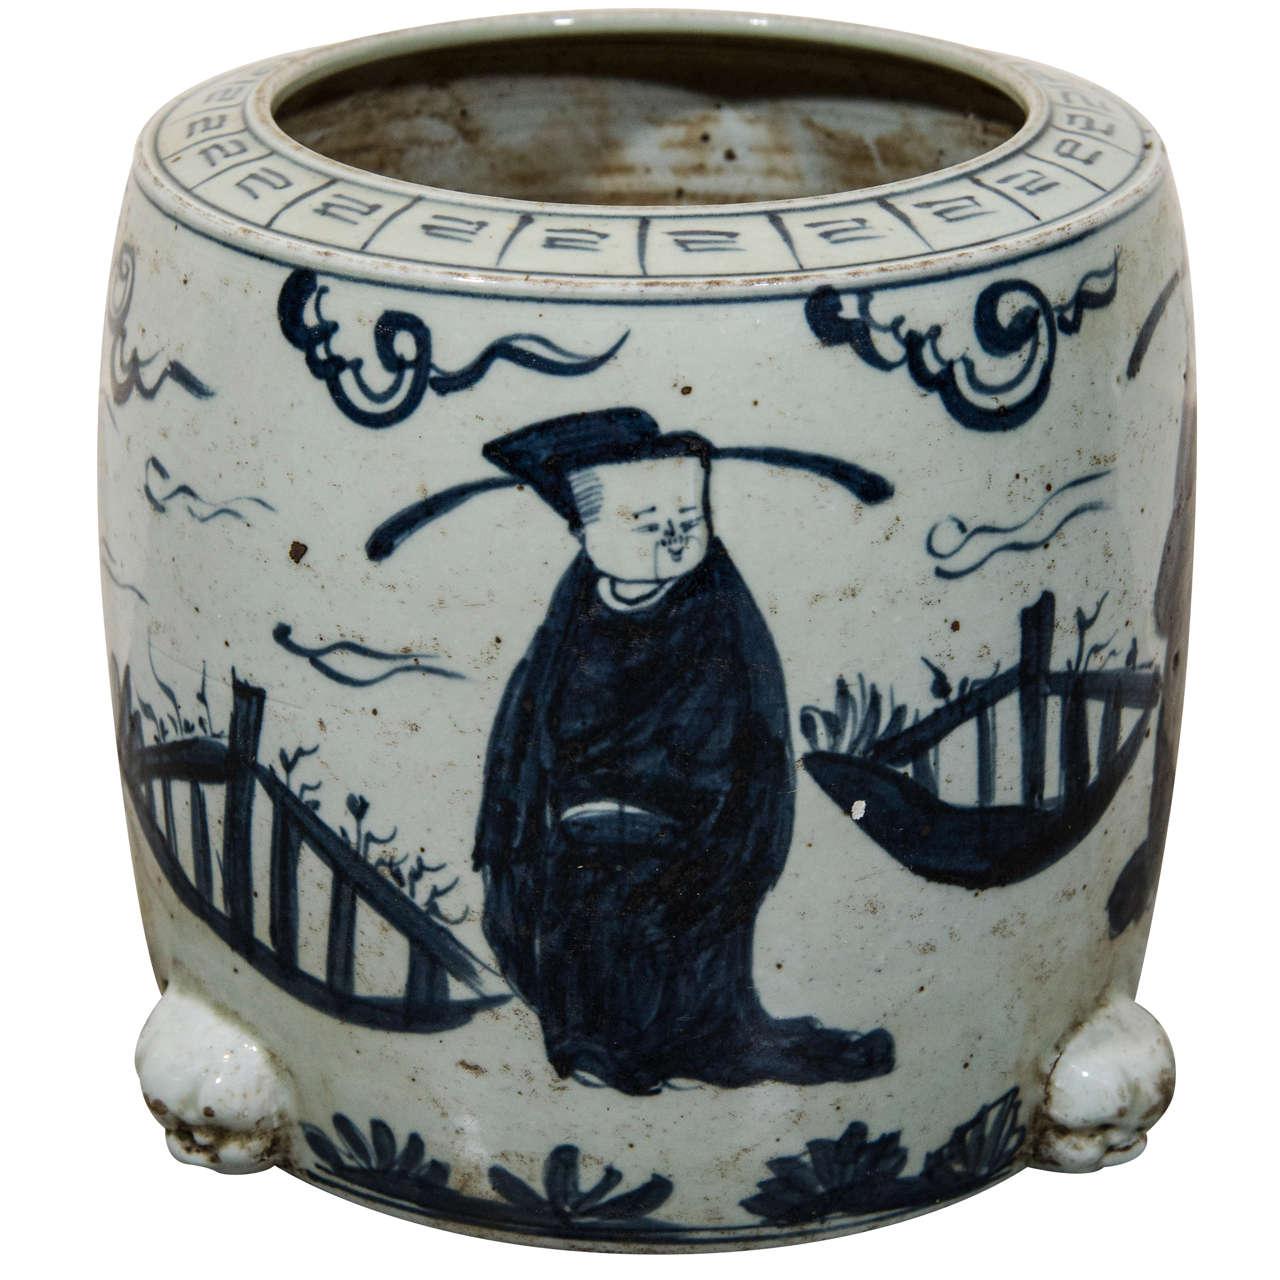 Antique Porcelain Brush Holder At 1stdibs